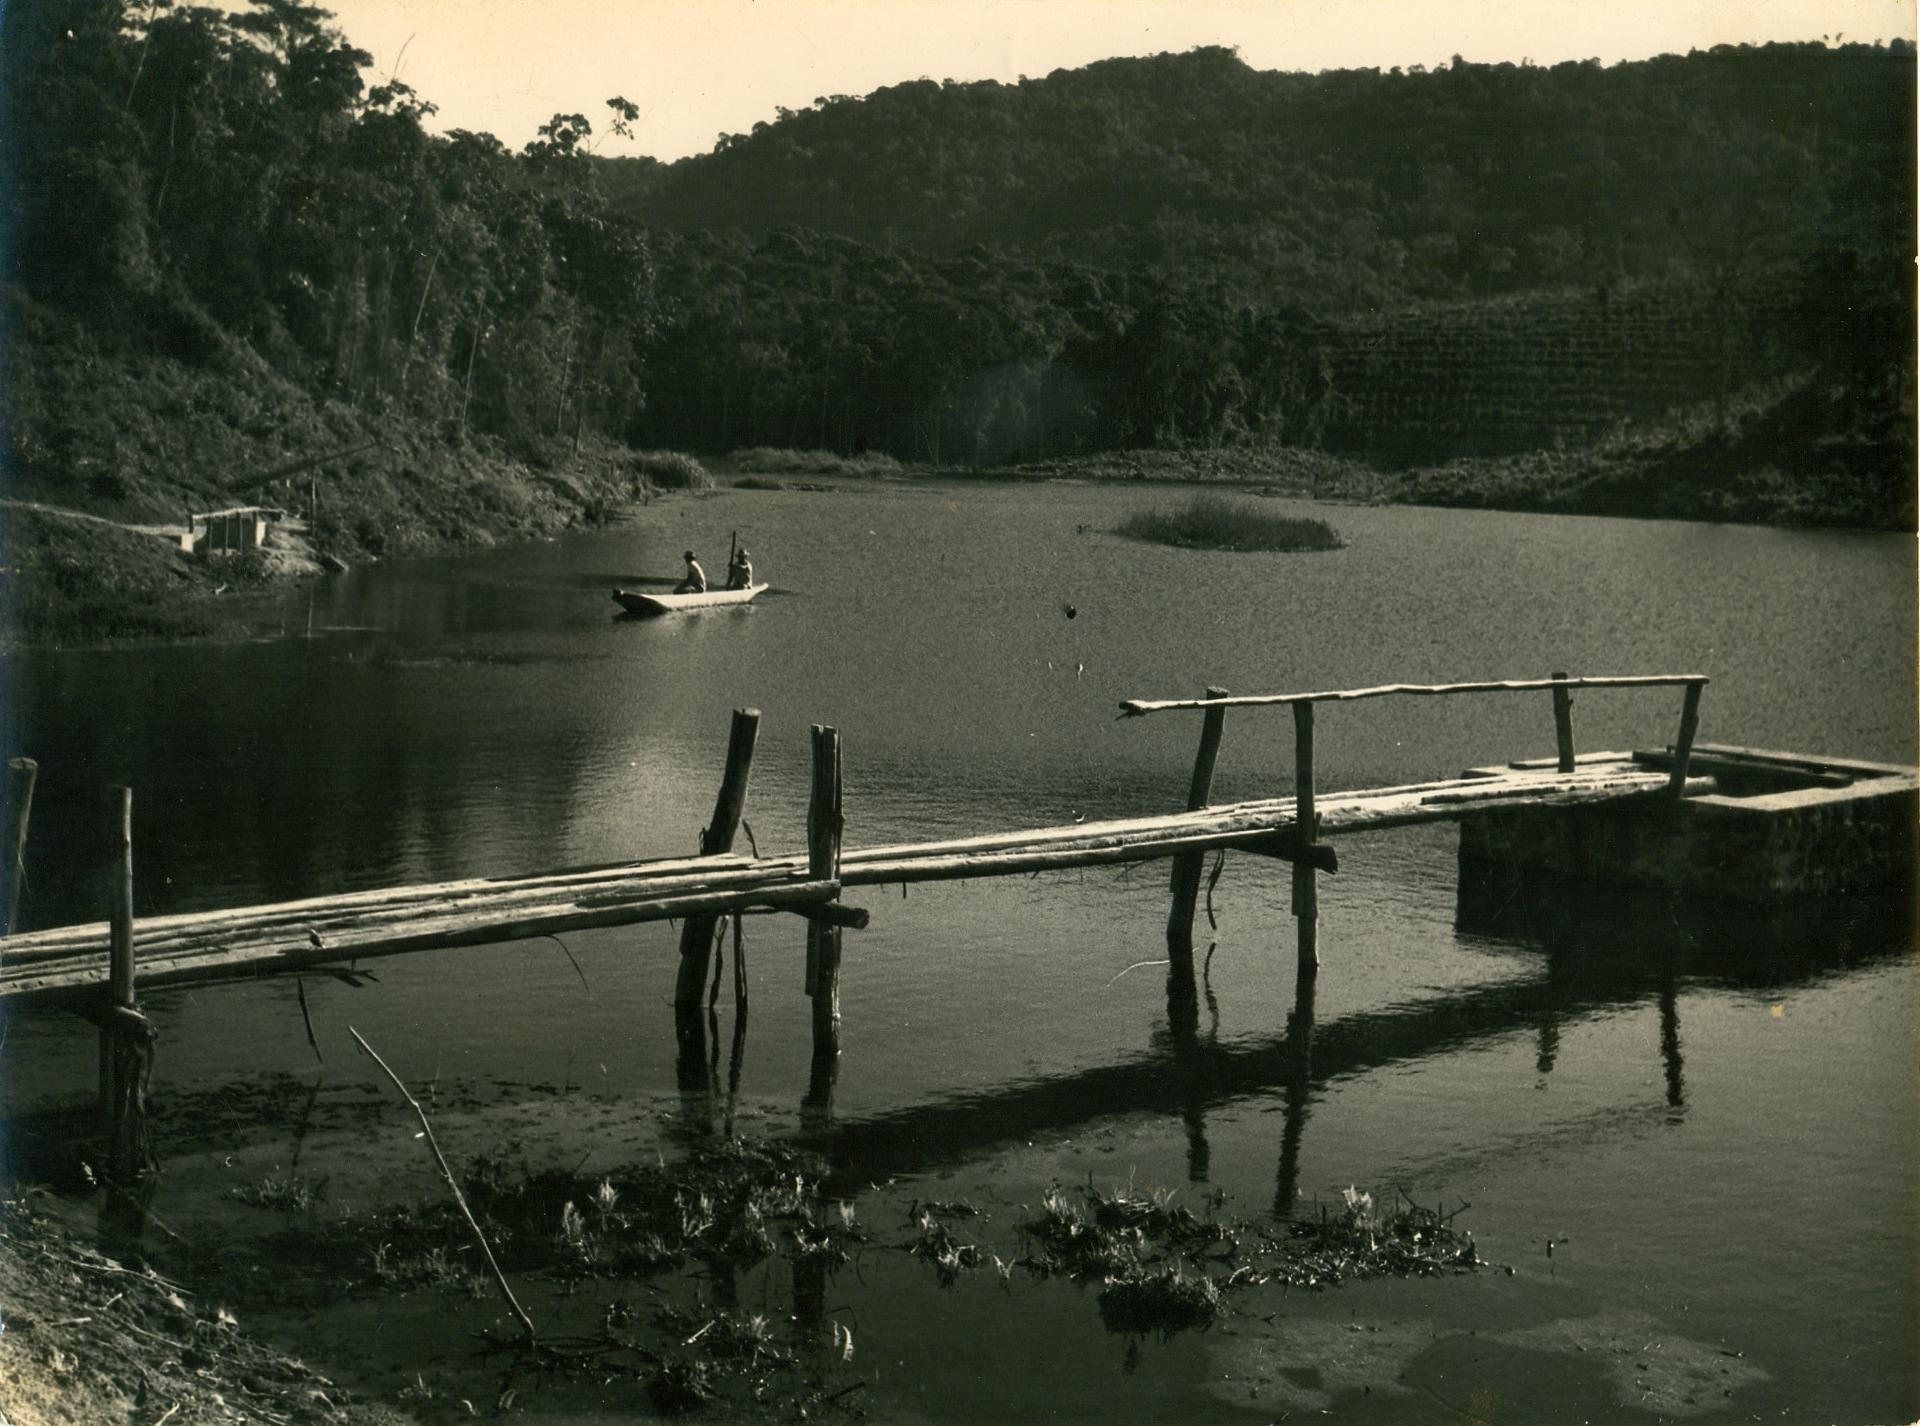 Le_nio ponte